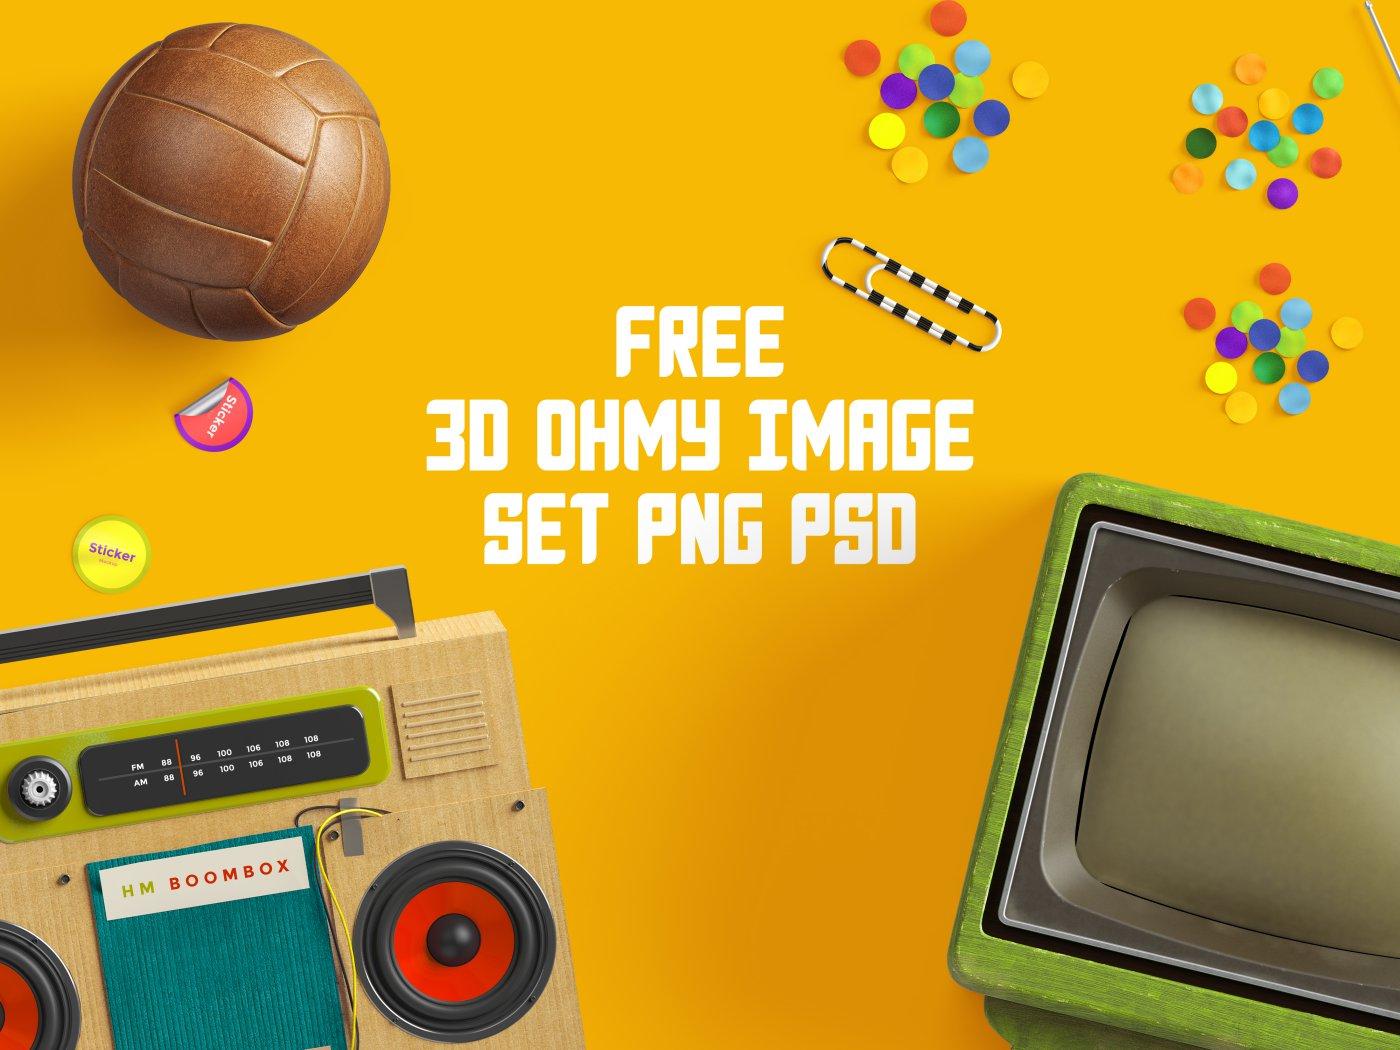 Free 3d OhMy Image set png psd растровый клипарт